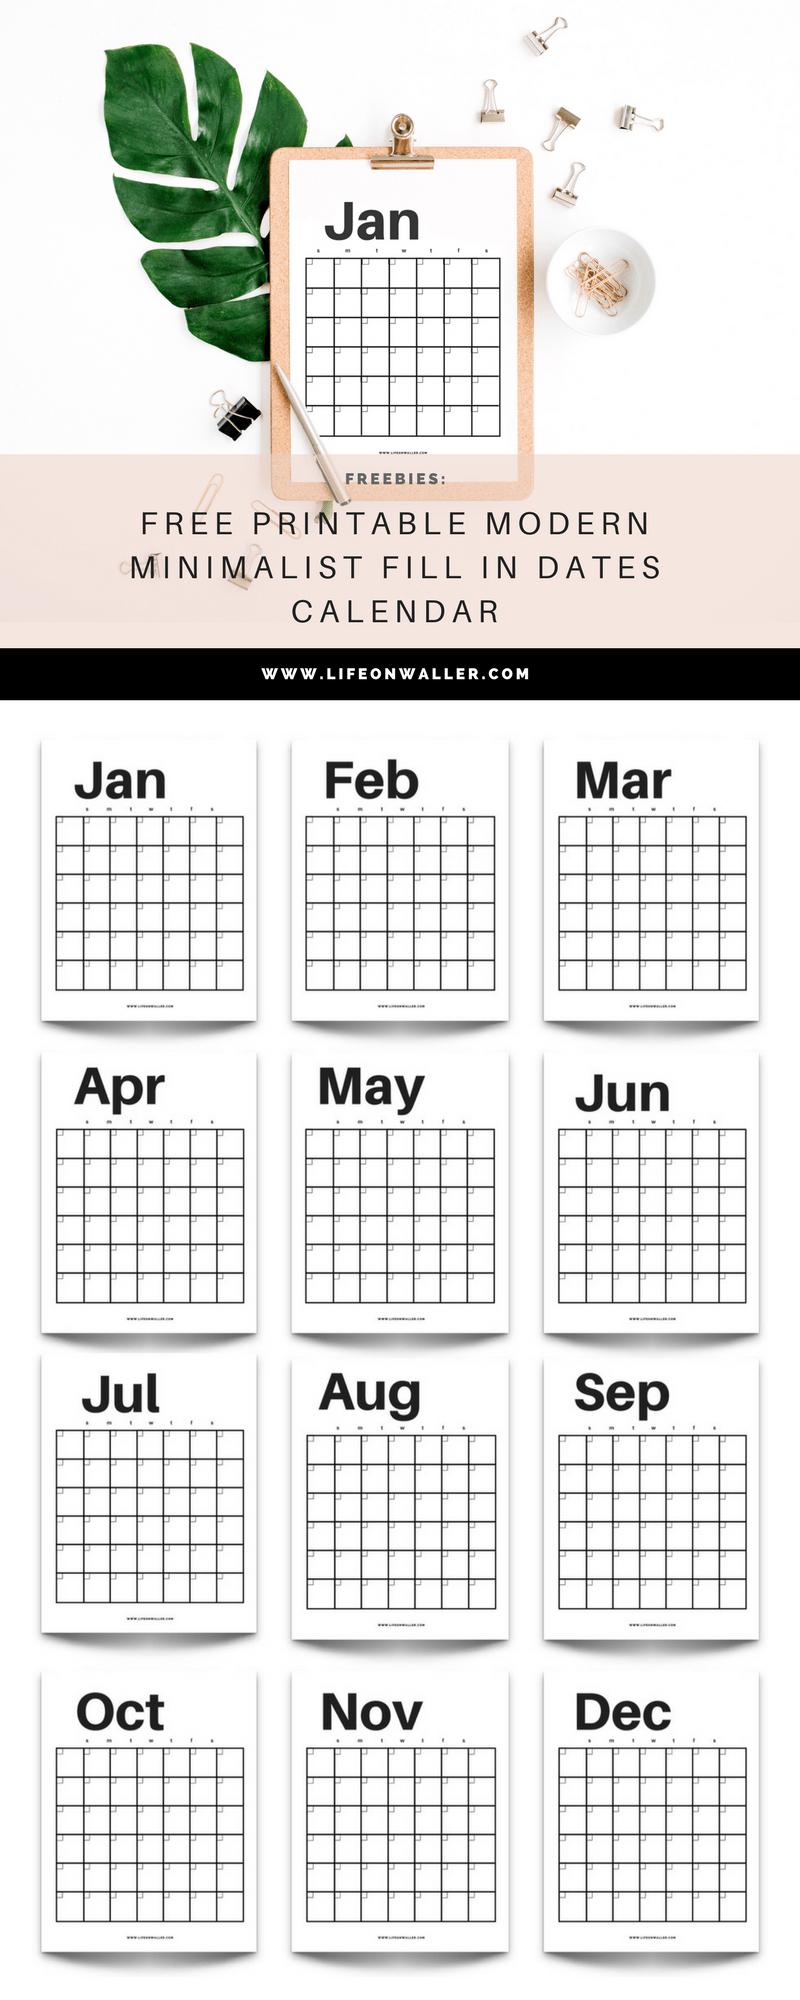 Free Fill In Printable Calendar | Calendar Printables Free Fill In Calendar Printable